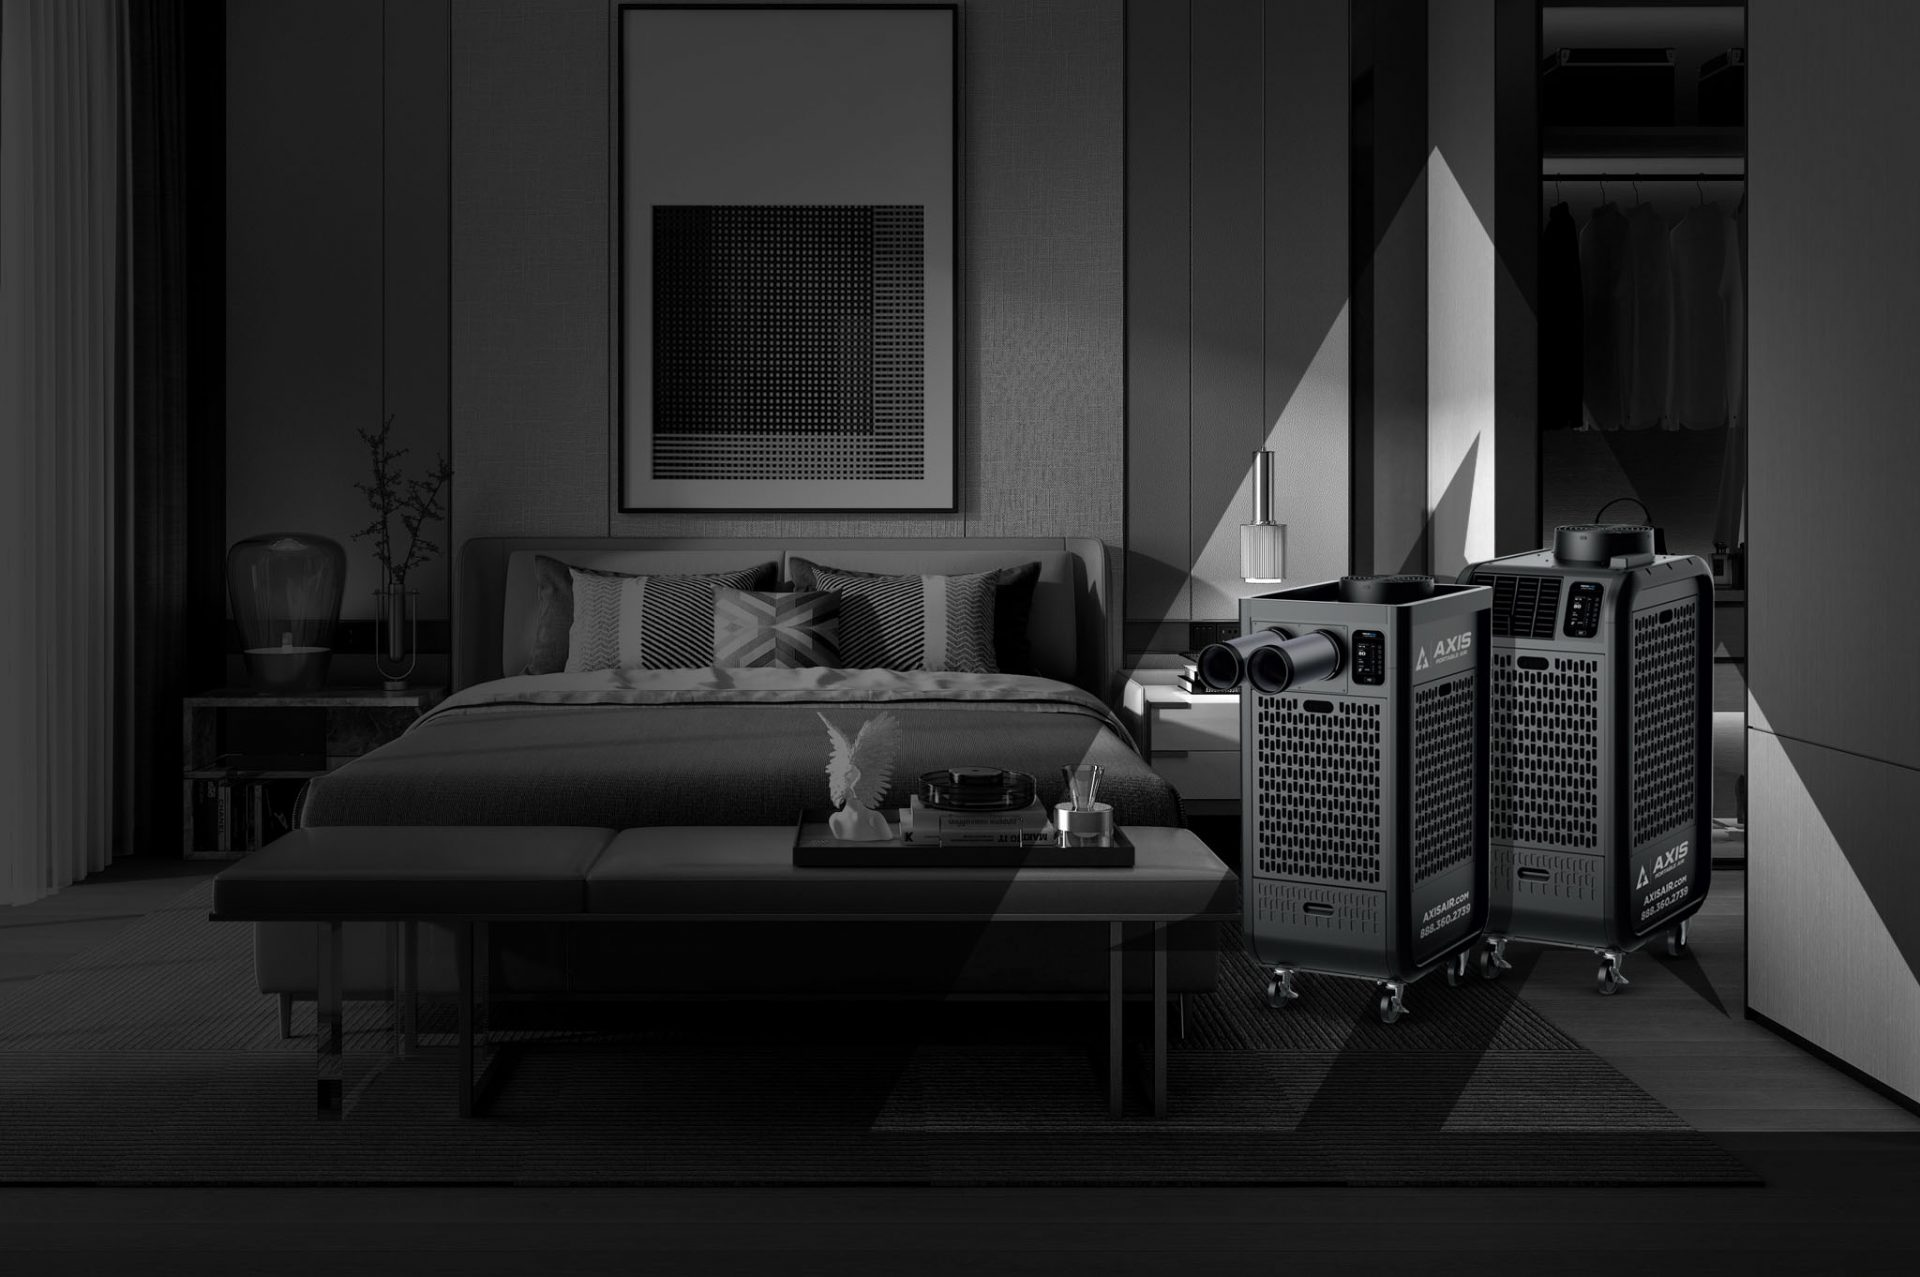 Axis Portable Air rentals